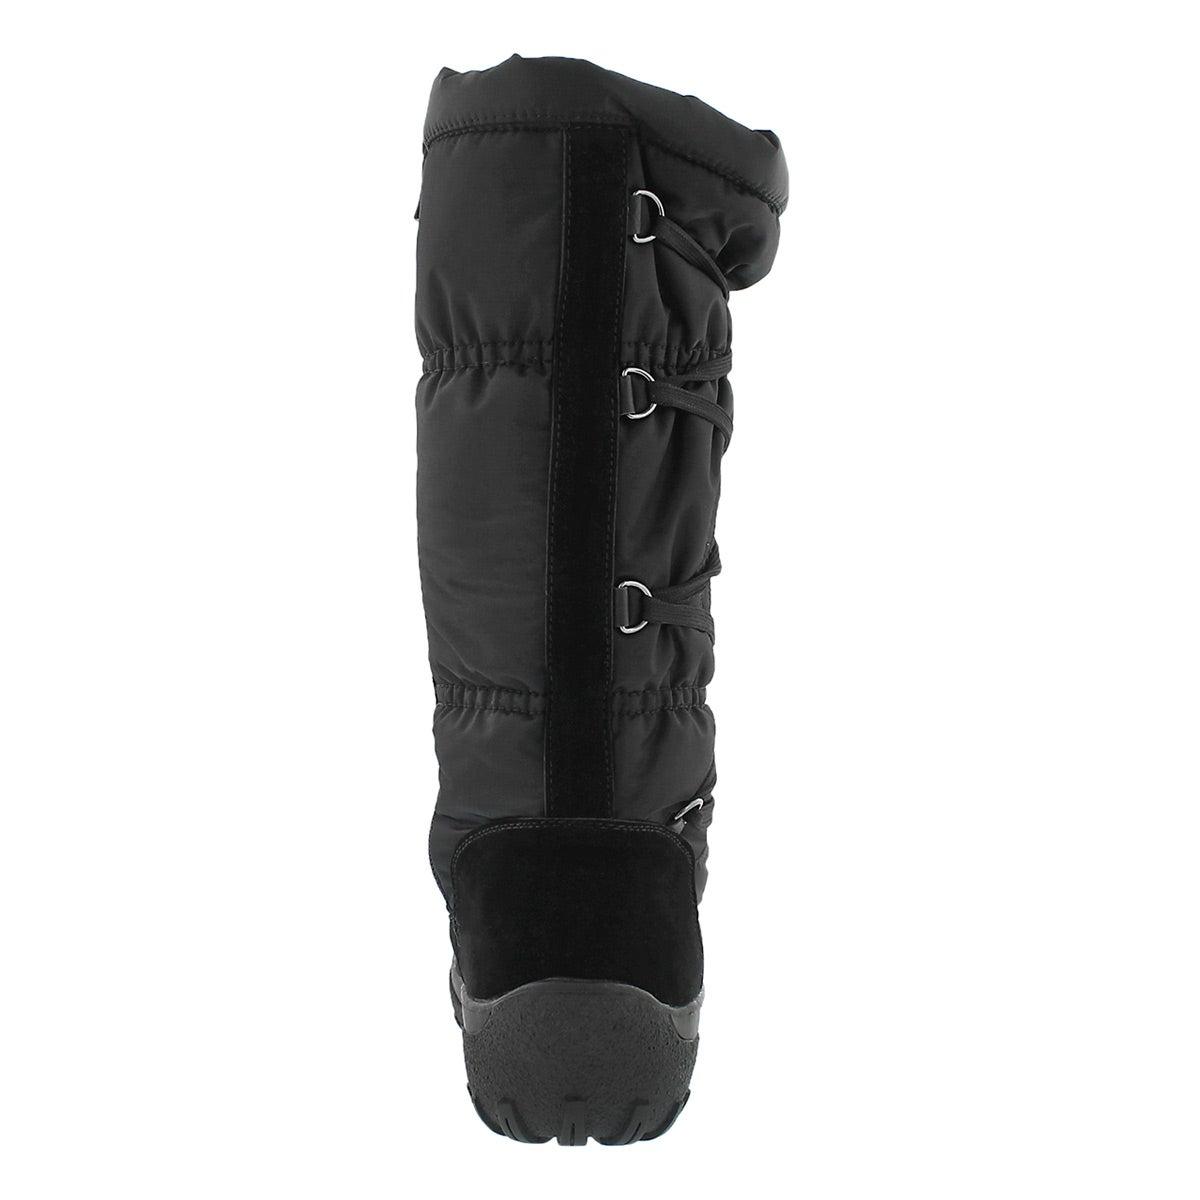 Lds Shayne blk wtrpf tall winter boot